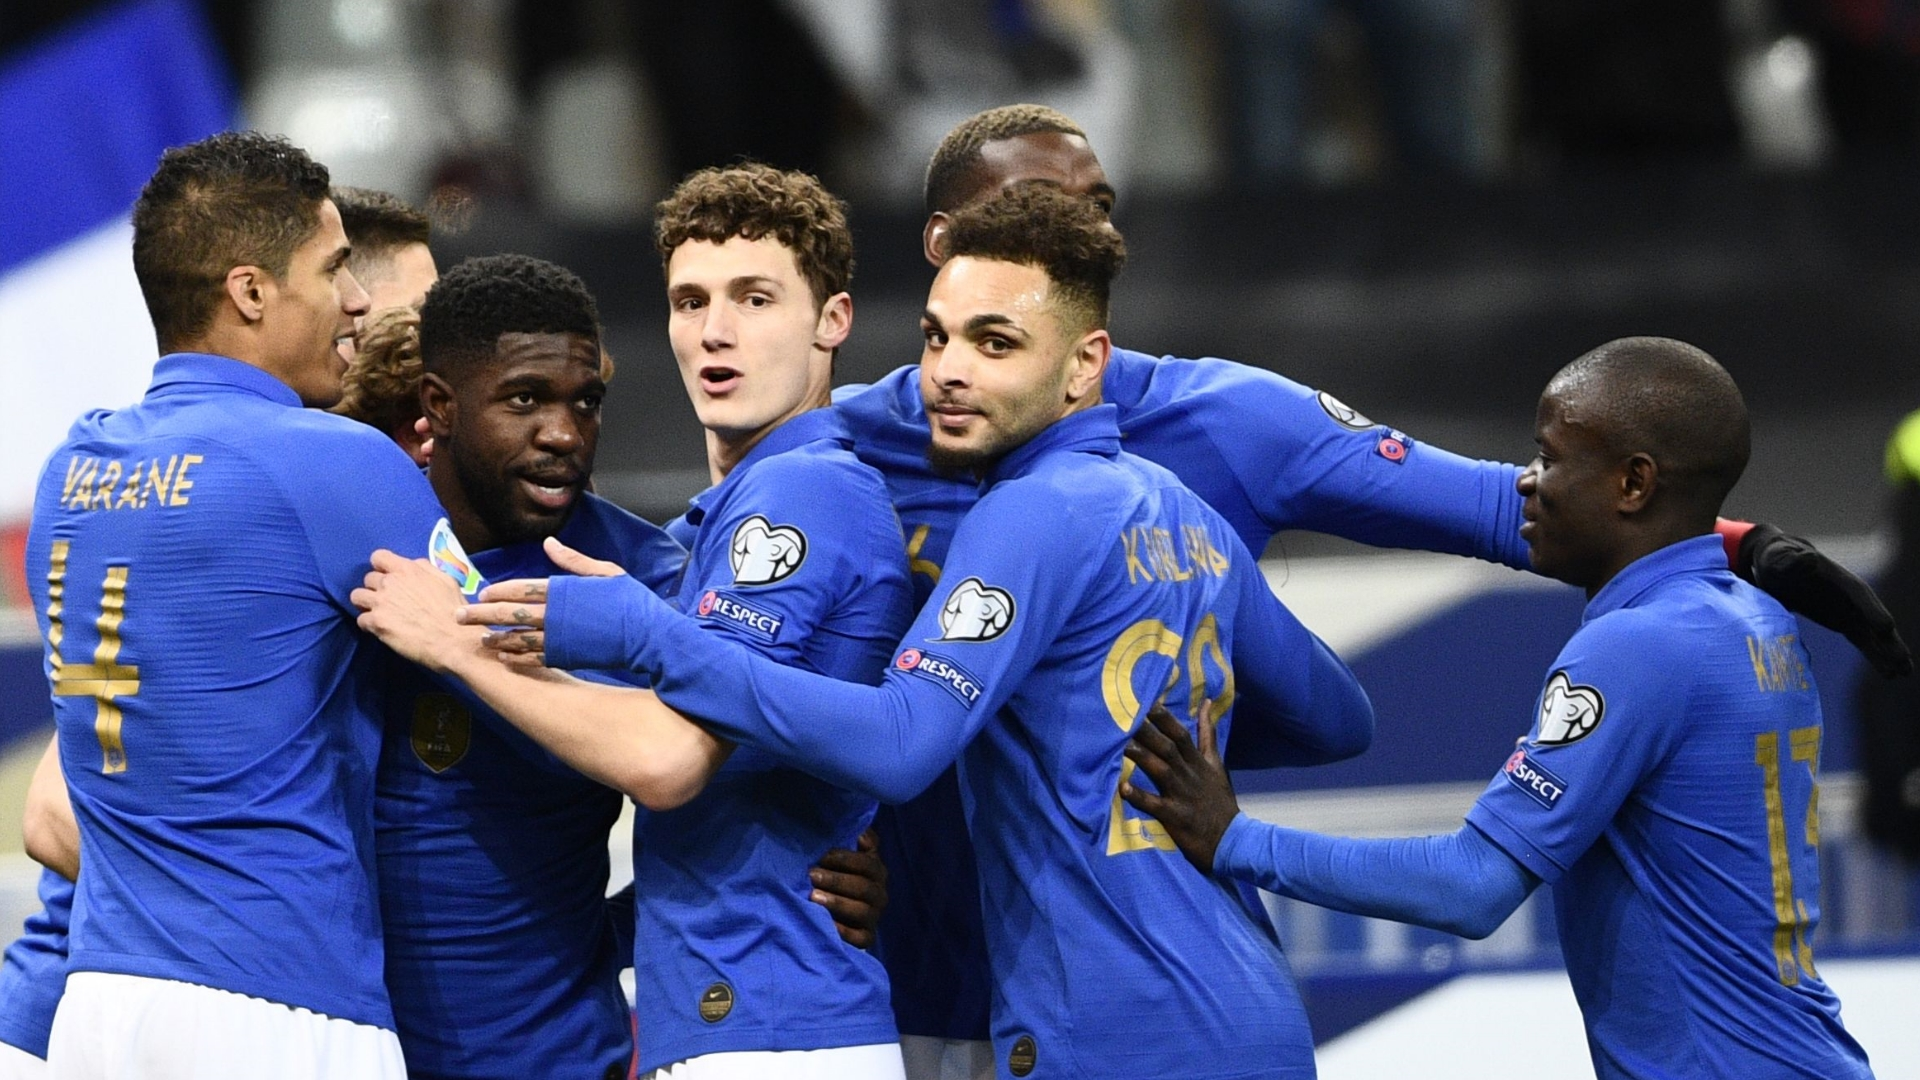 France celebrate vs Iceland 2019 EC Qualifiers